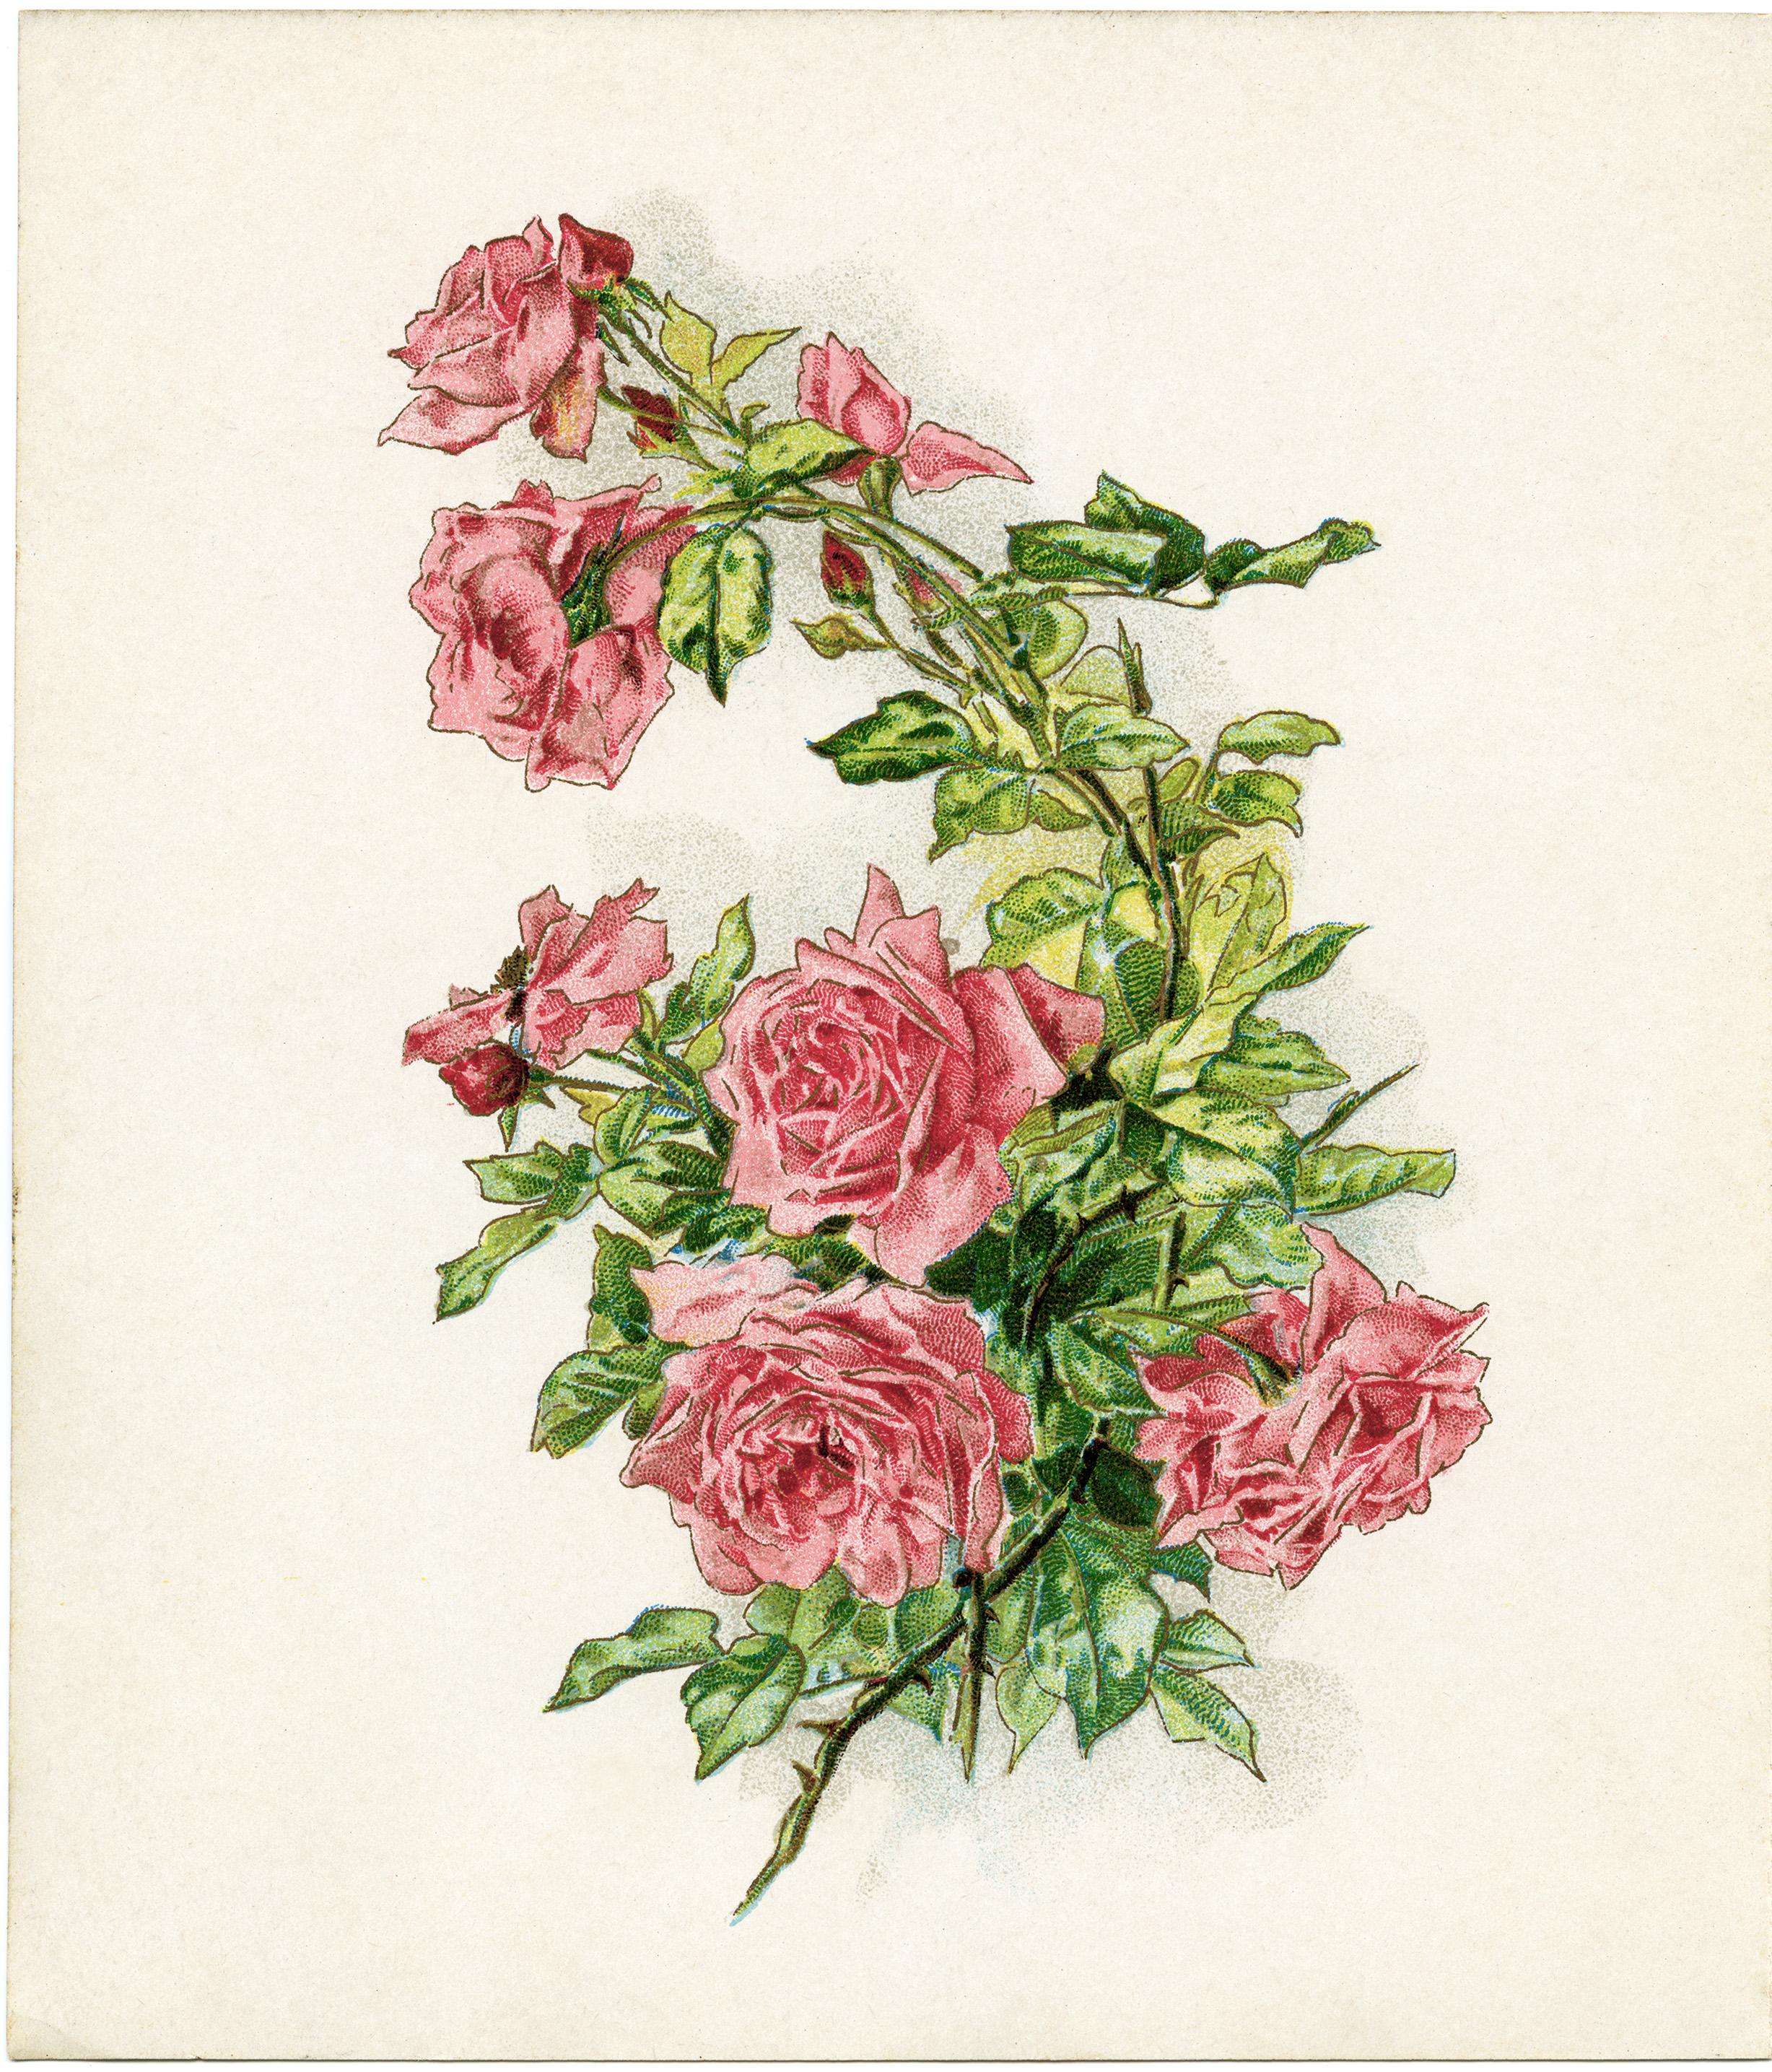 vintage rose background Images, Stock Photos & Vectors ...